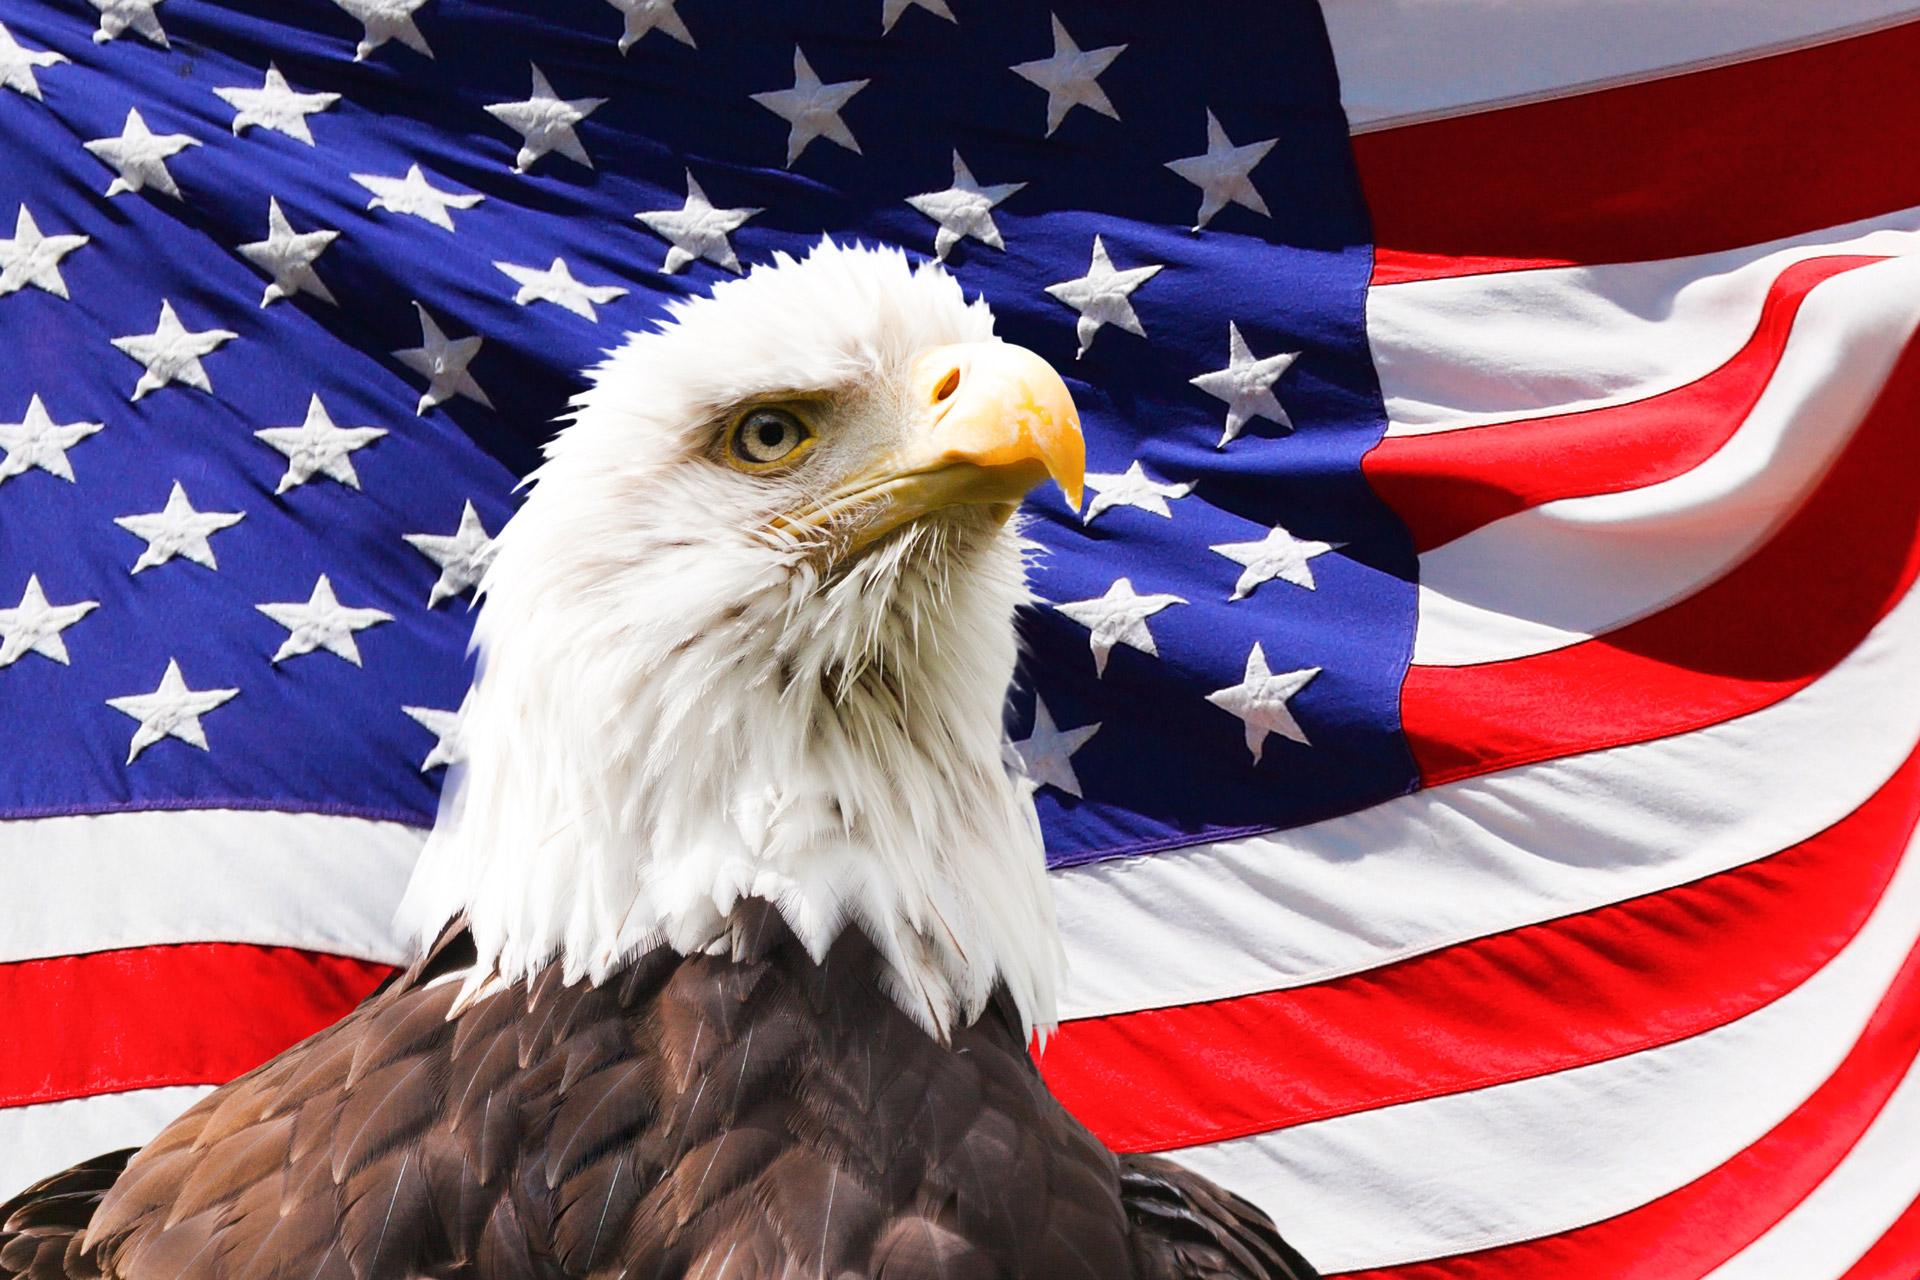 Drawn steller's sea eagle usa flag Hawks Accipitridae Lee's Kites Harpy